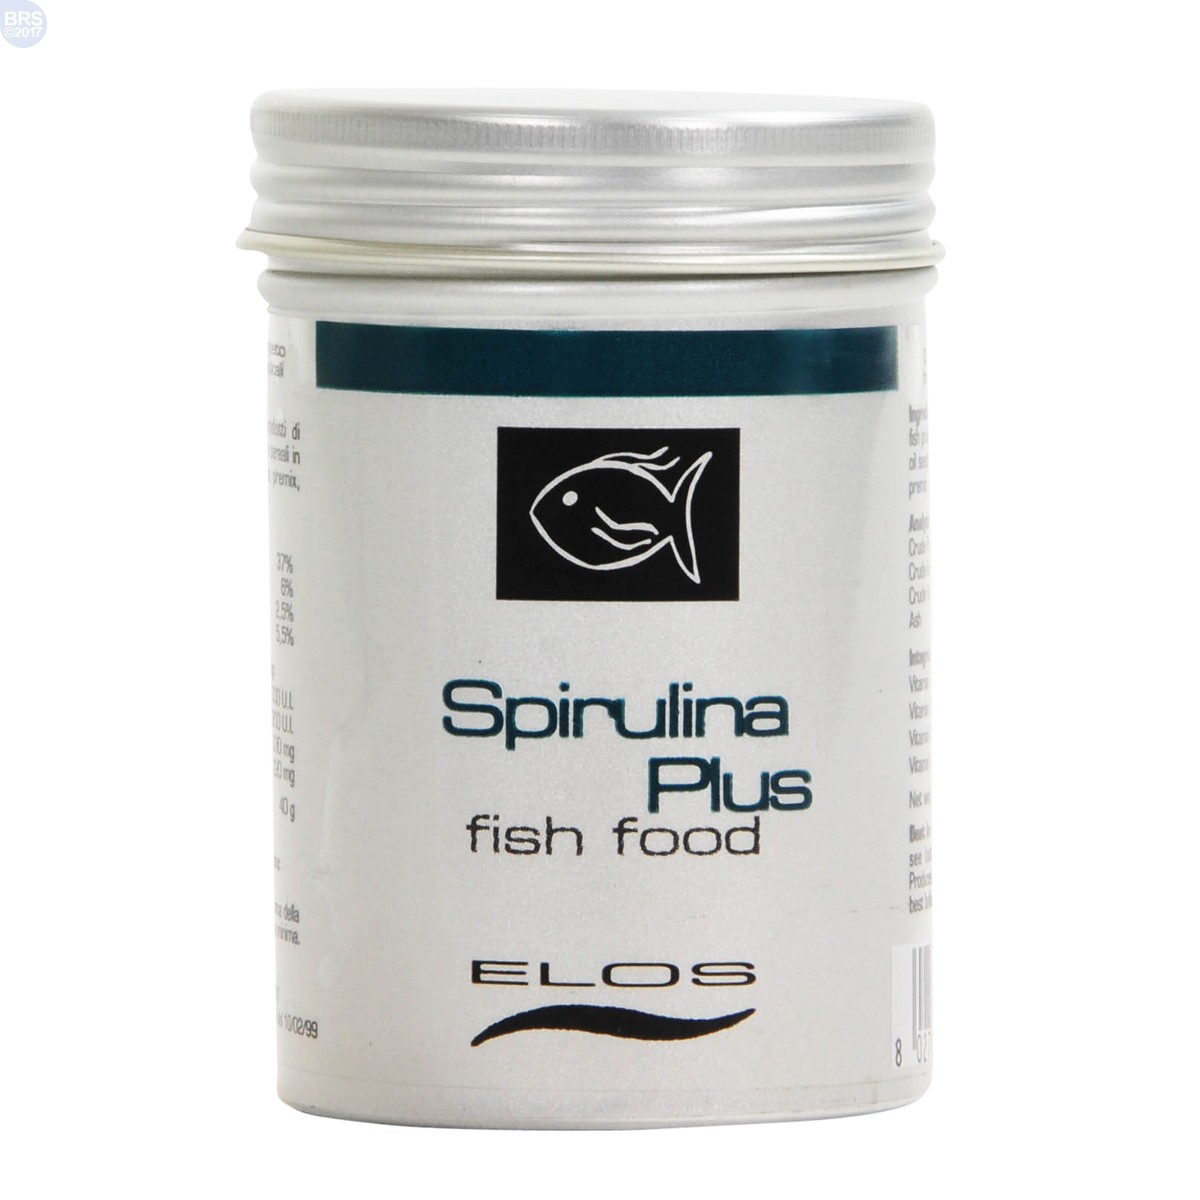 Elos spirulina plus fish food bulk reef supply for Spirulina fish food